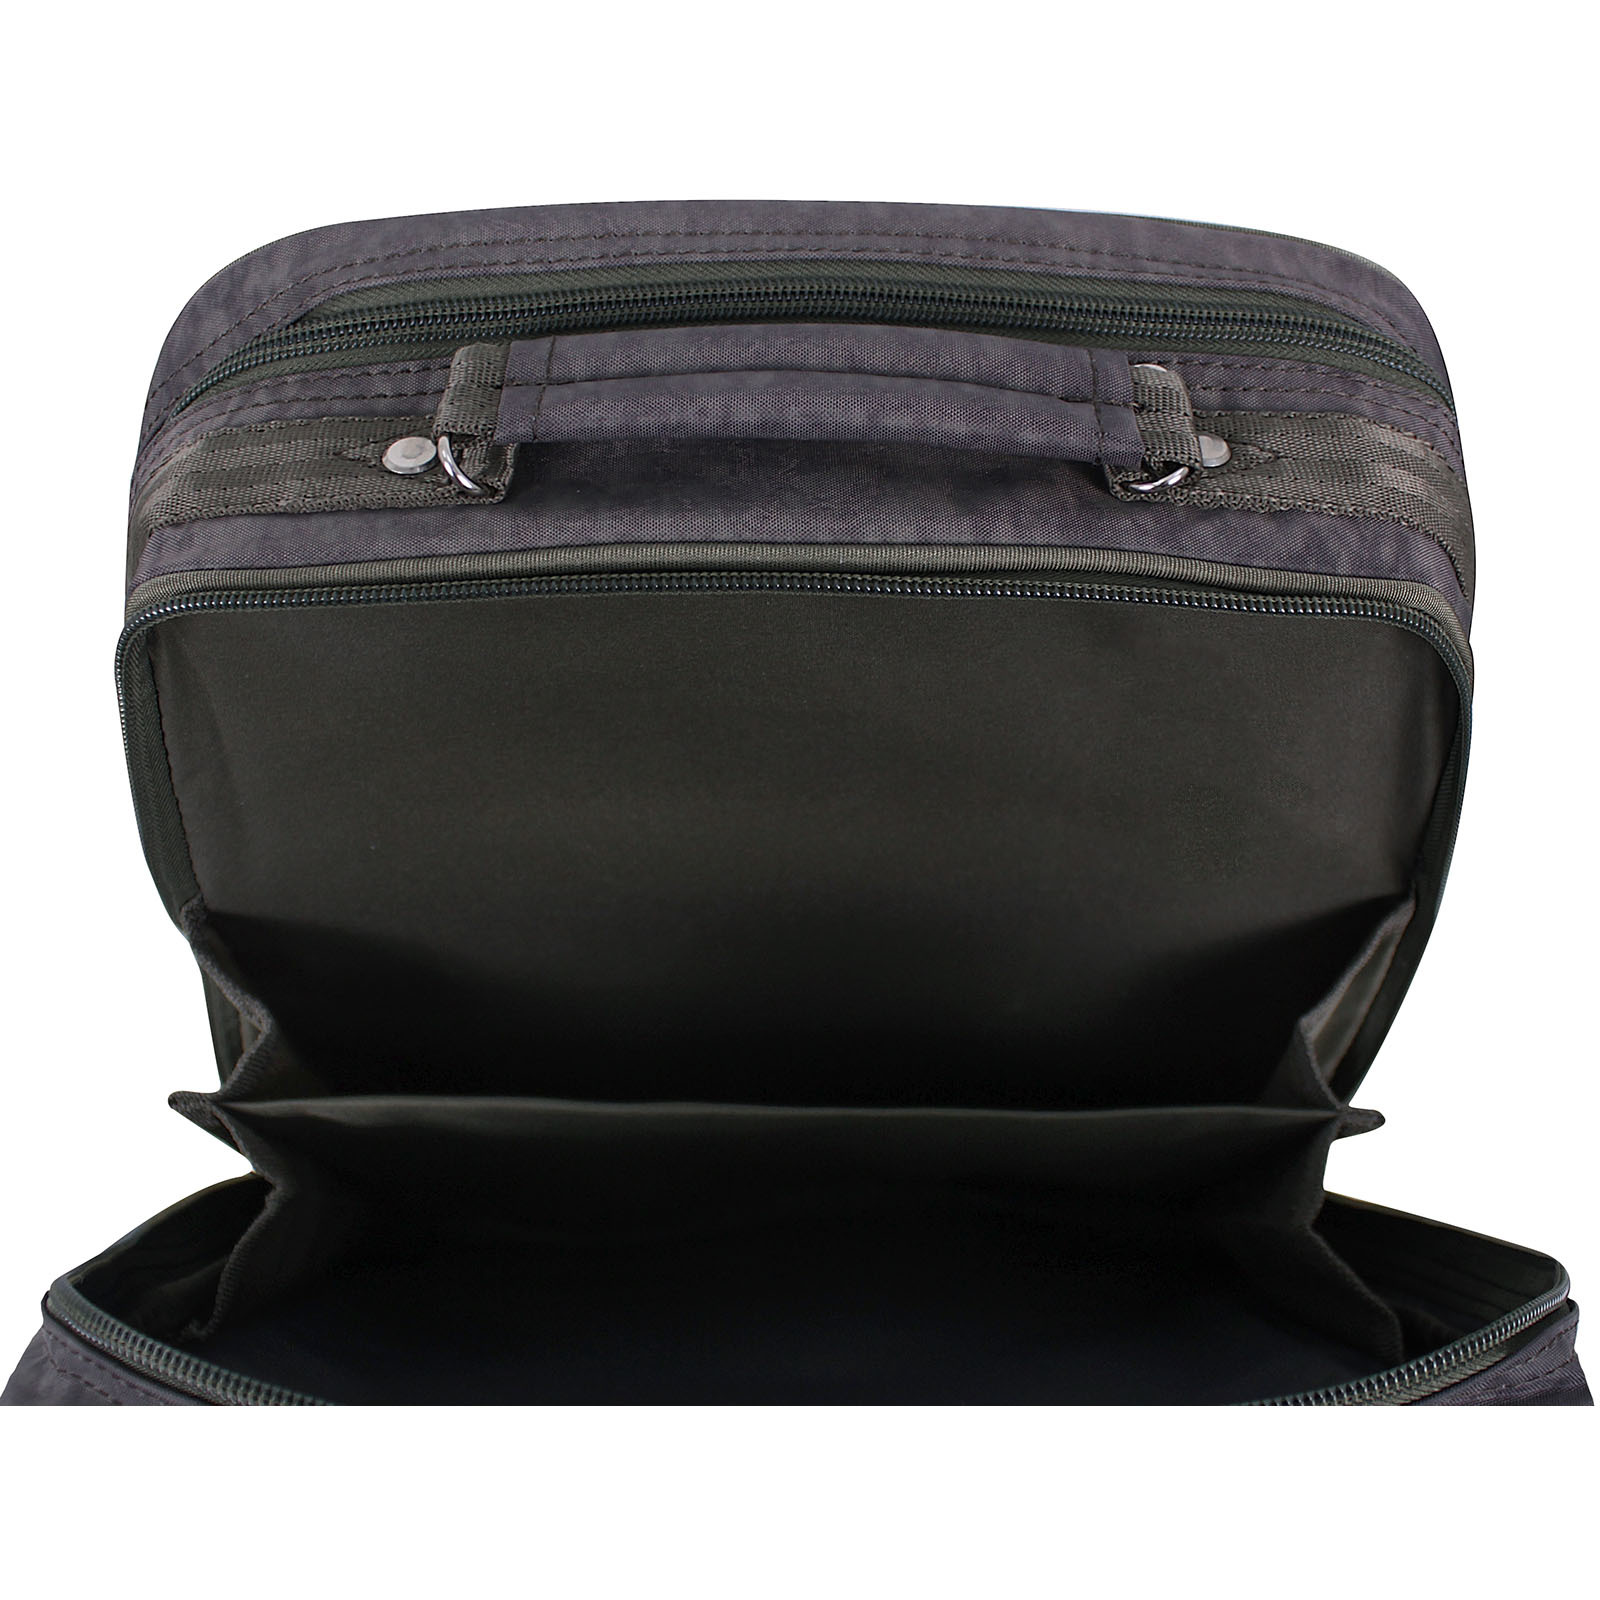 Мужская сумка Bagland Комерсант 11 л. Хаки (0023870) фото 5